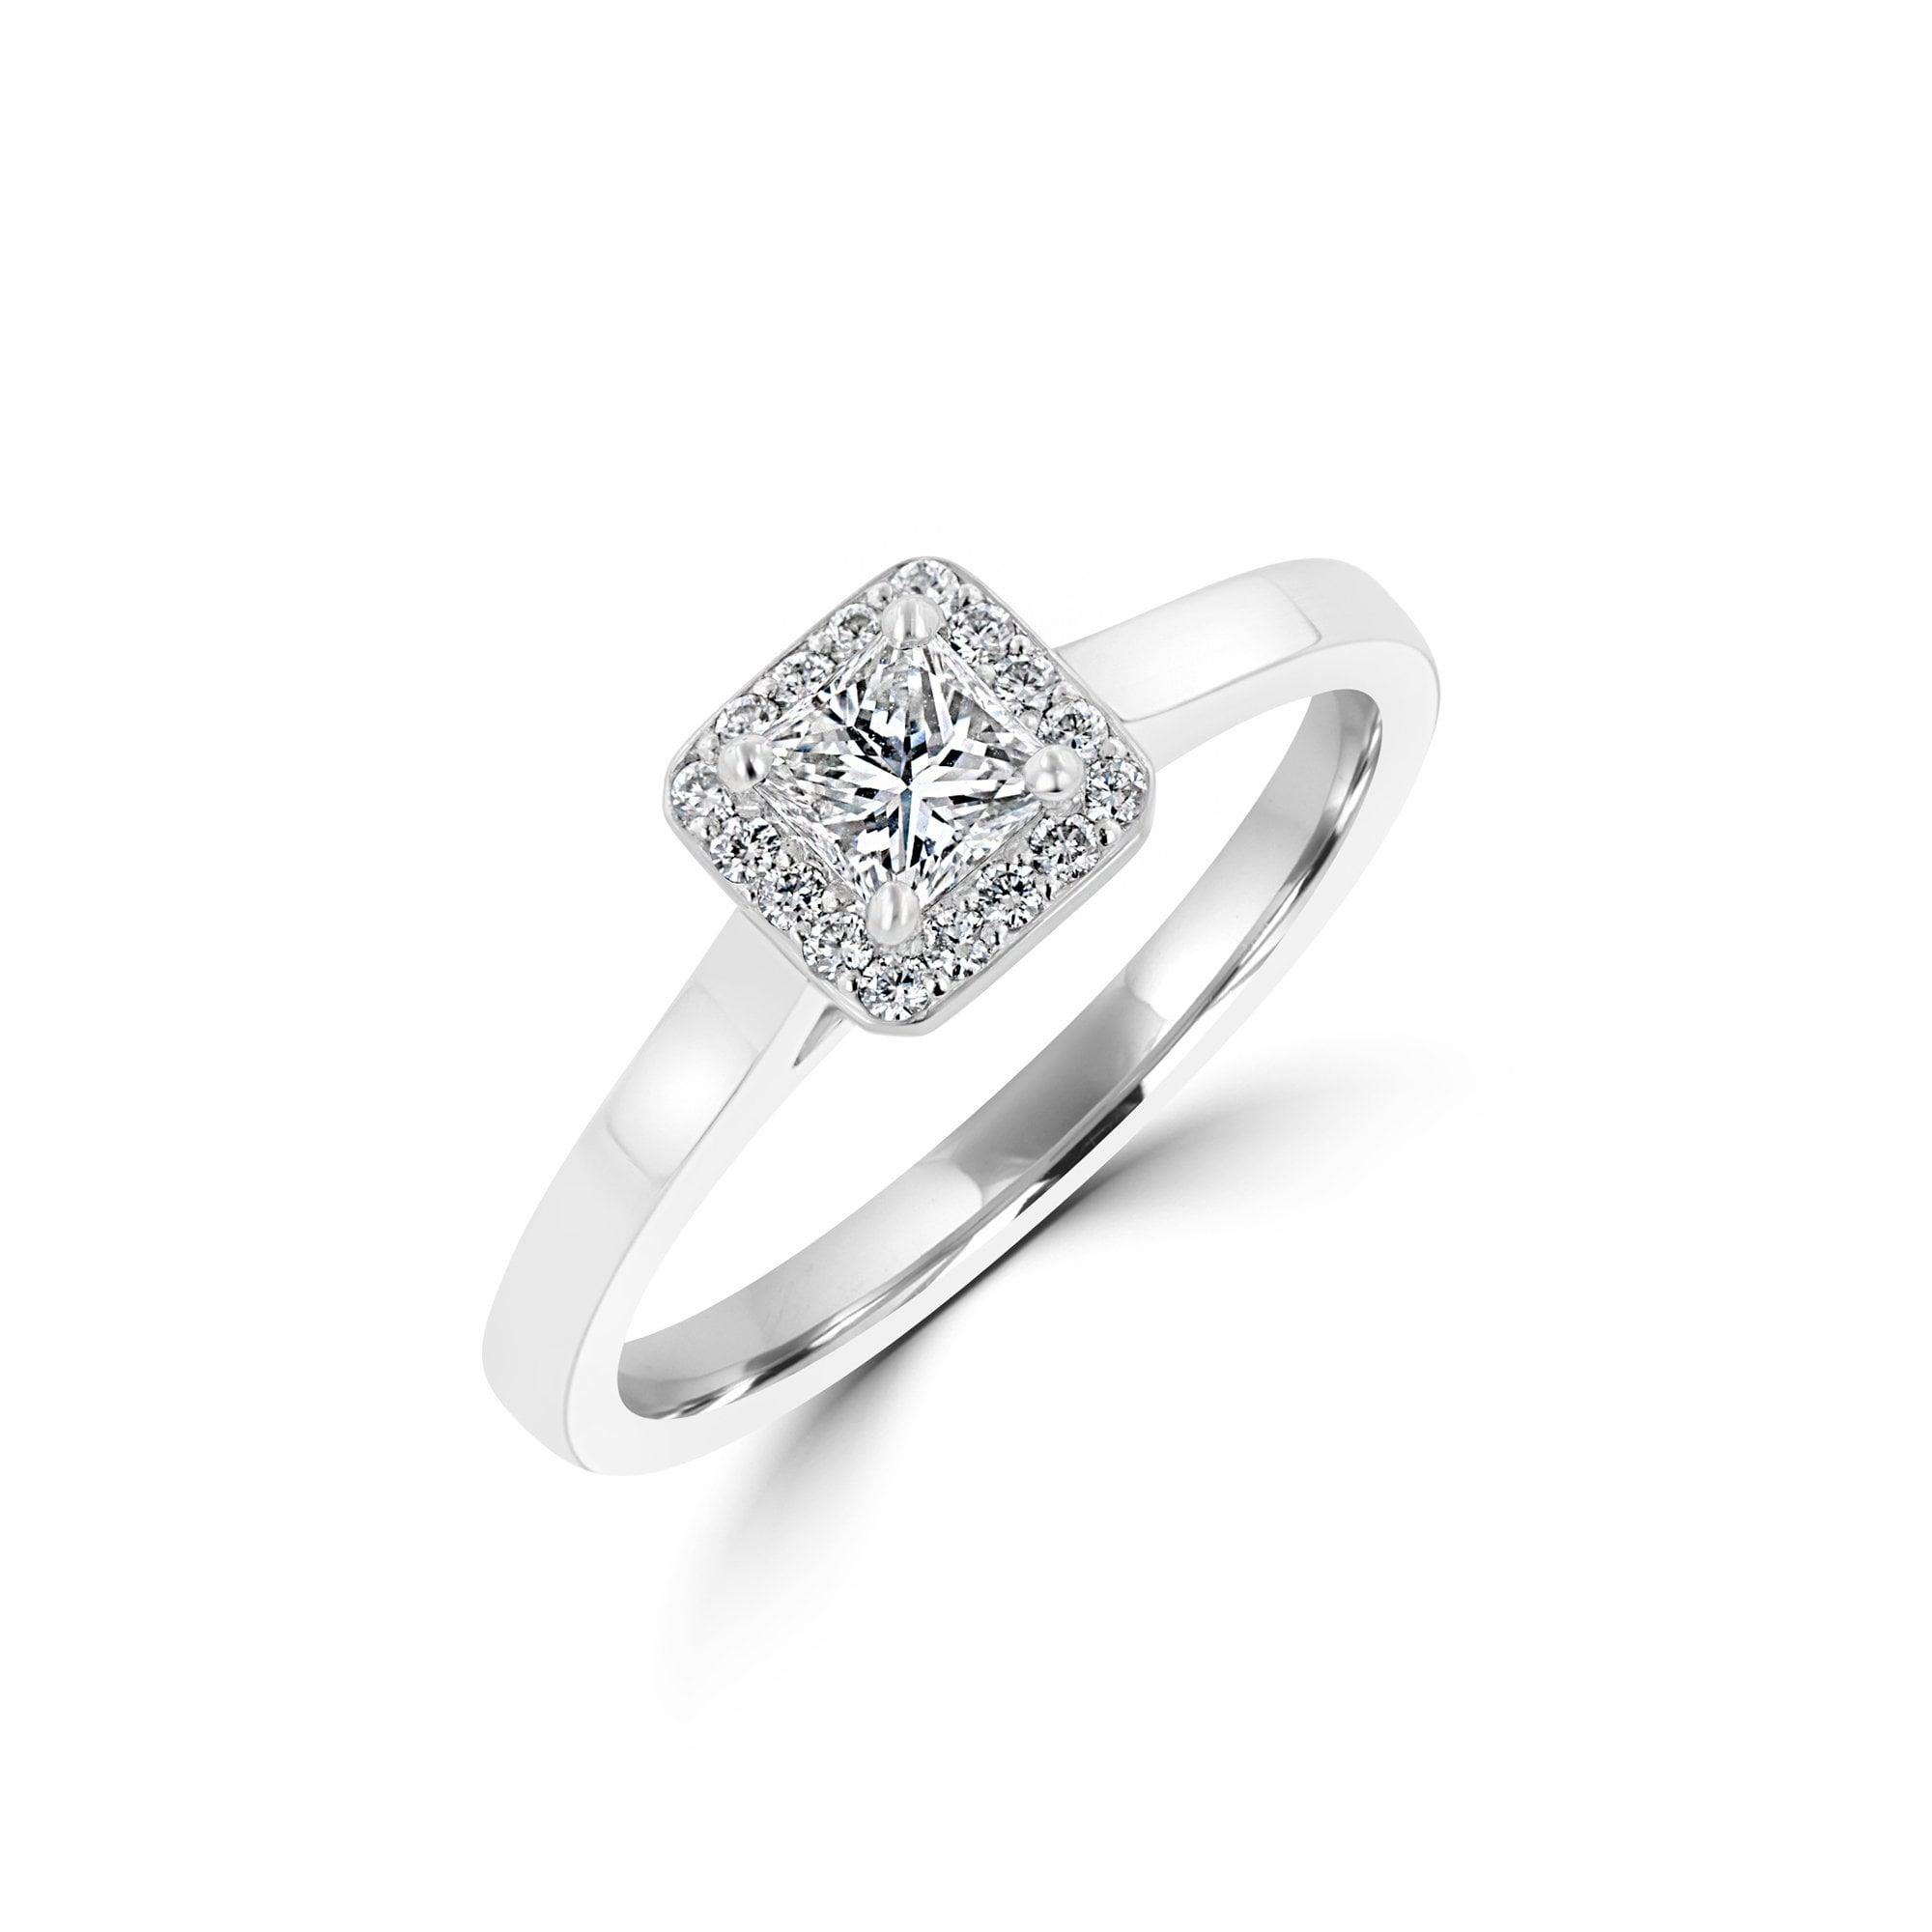 Diamond Halo Ring Avanti Jewellers Engagement Ring Specialist